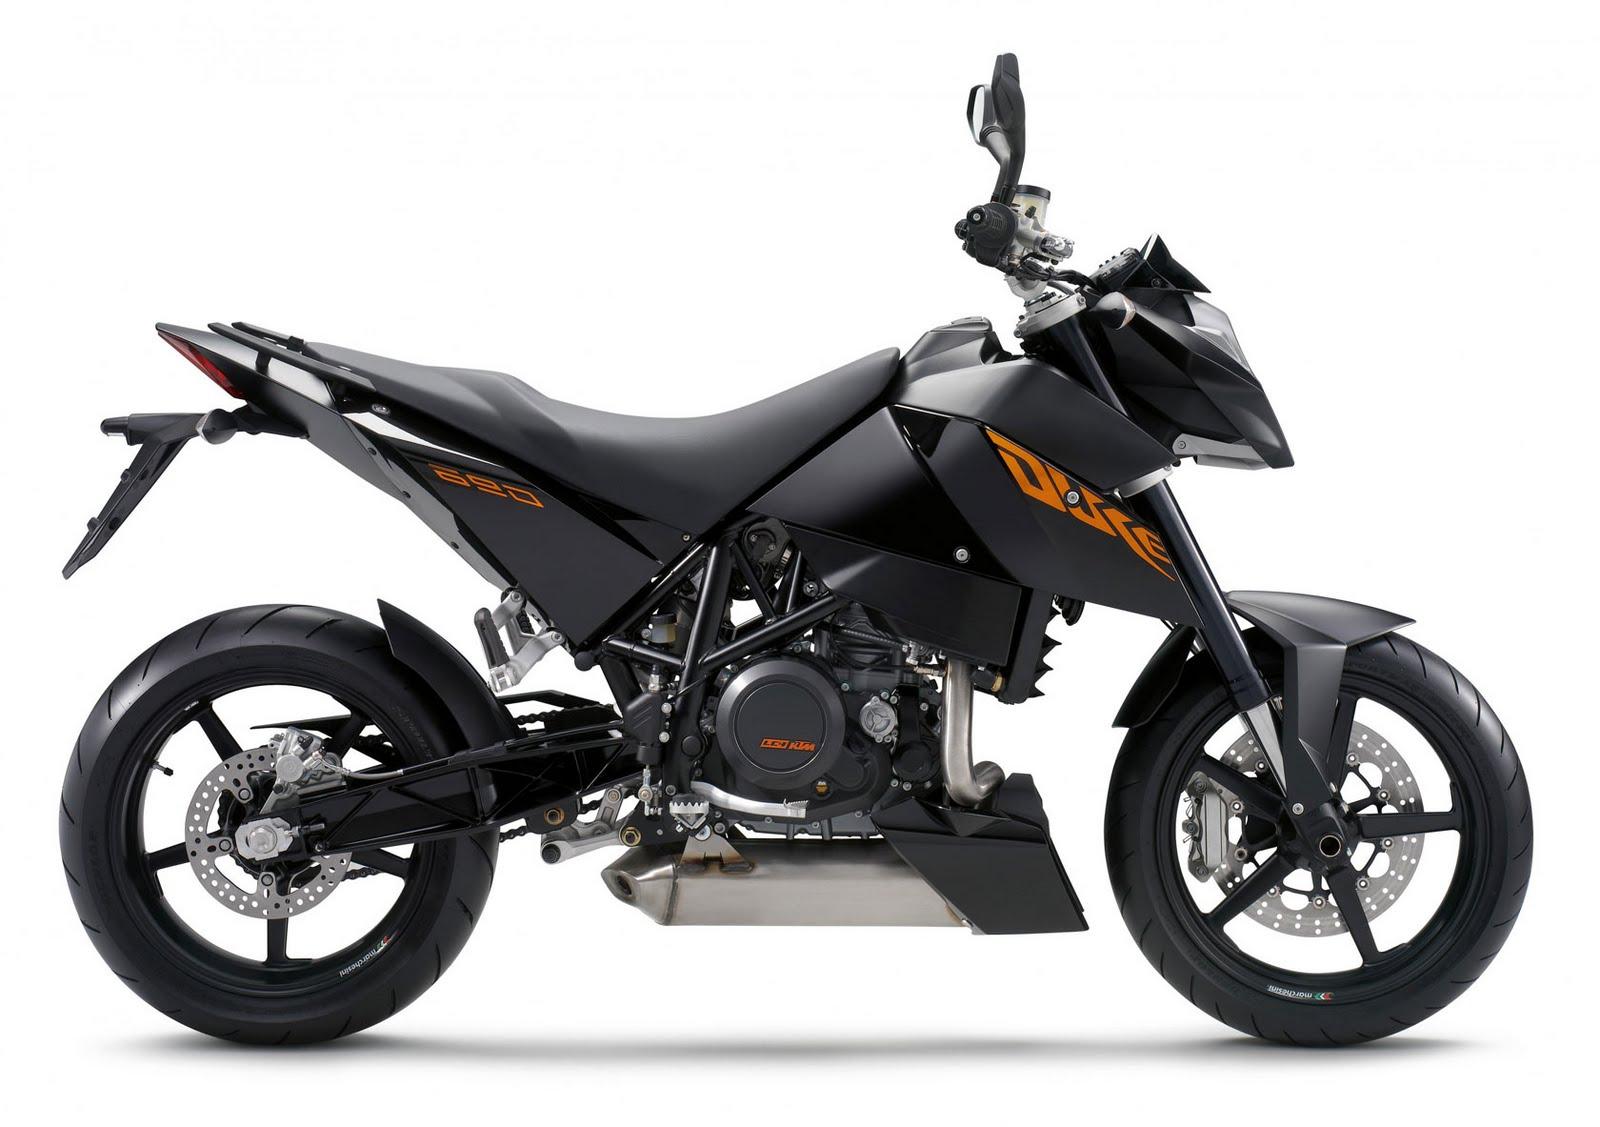 top motorcycle review 2010 ktm 690 duke r. Black Bedroom Furniture Sets. Home Design Ideas